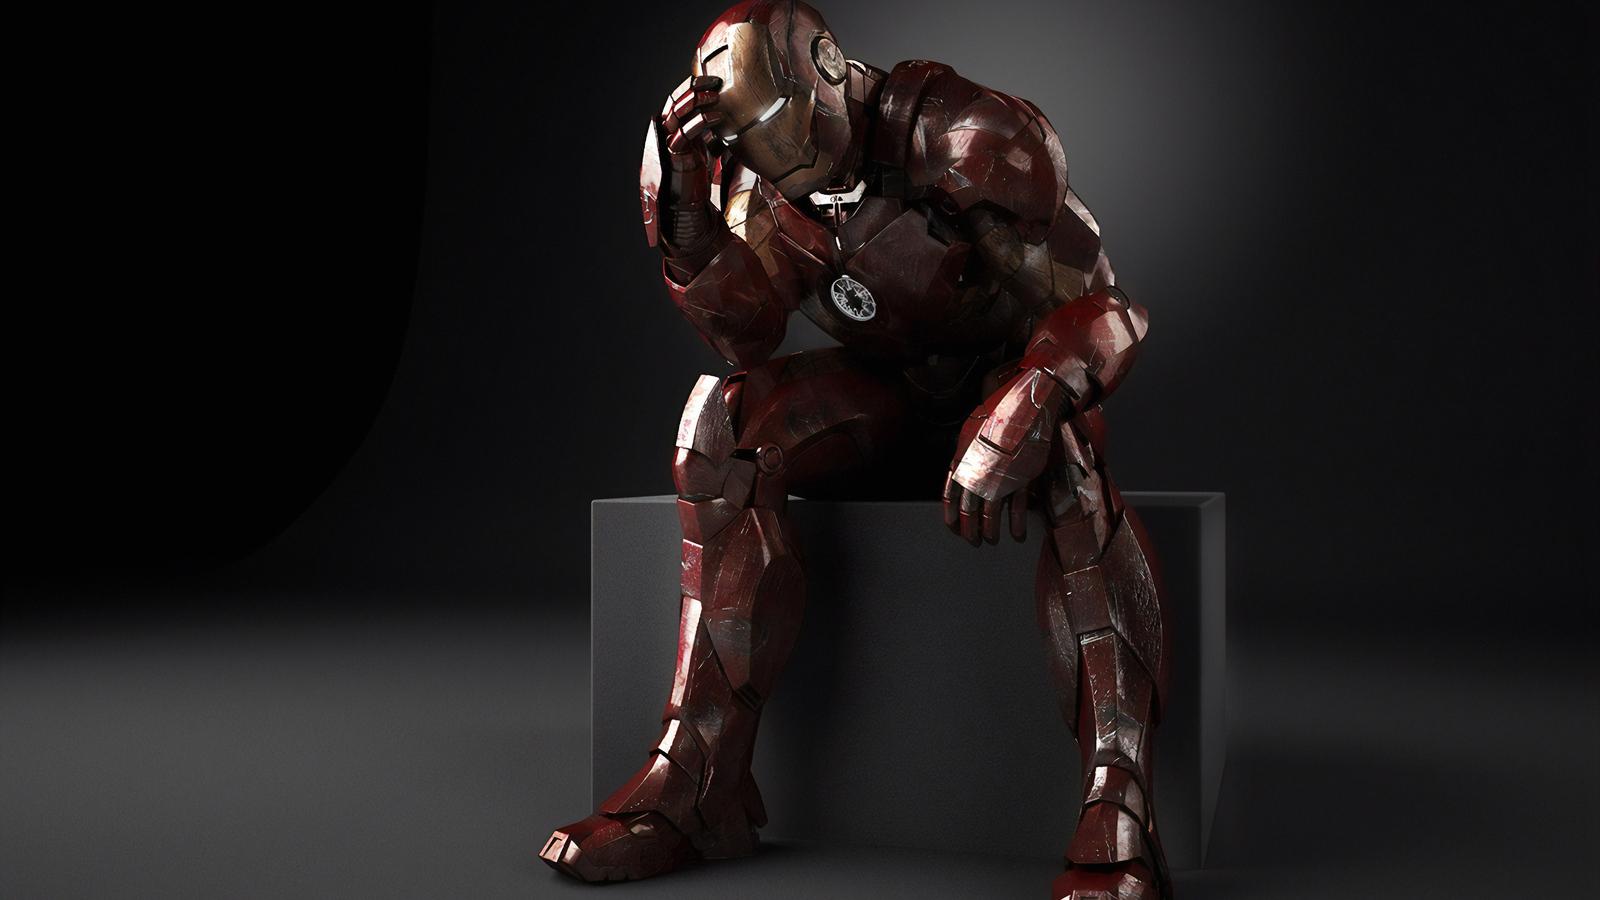 iron-man-thinking-2i.jpg